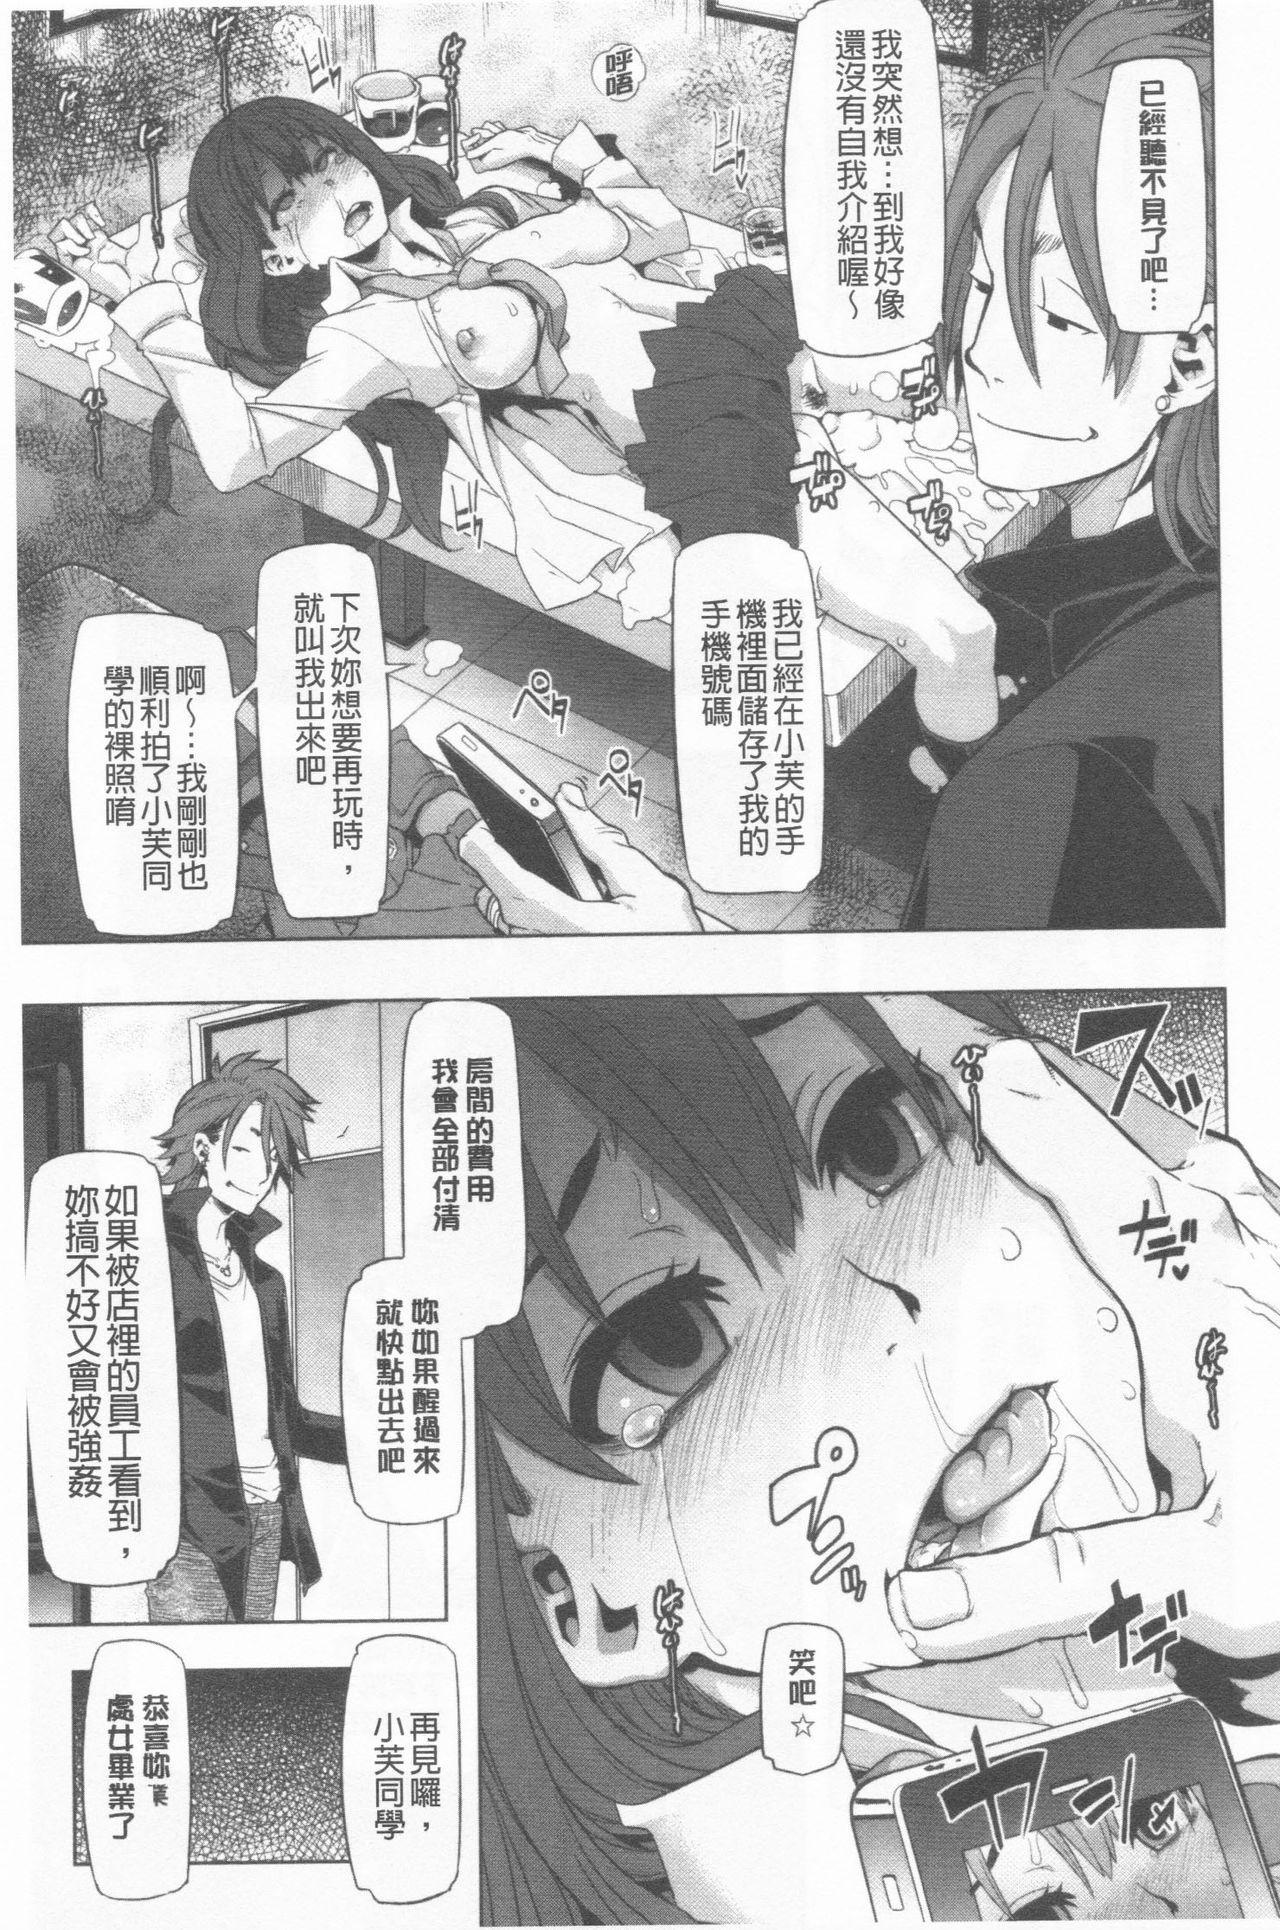 Henshin + 4P leaflet 31